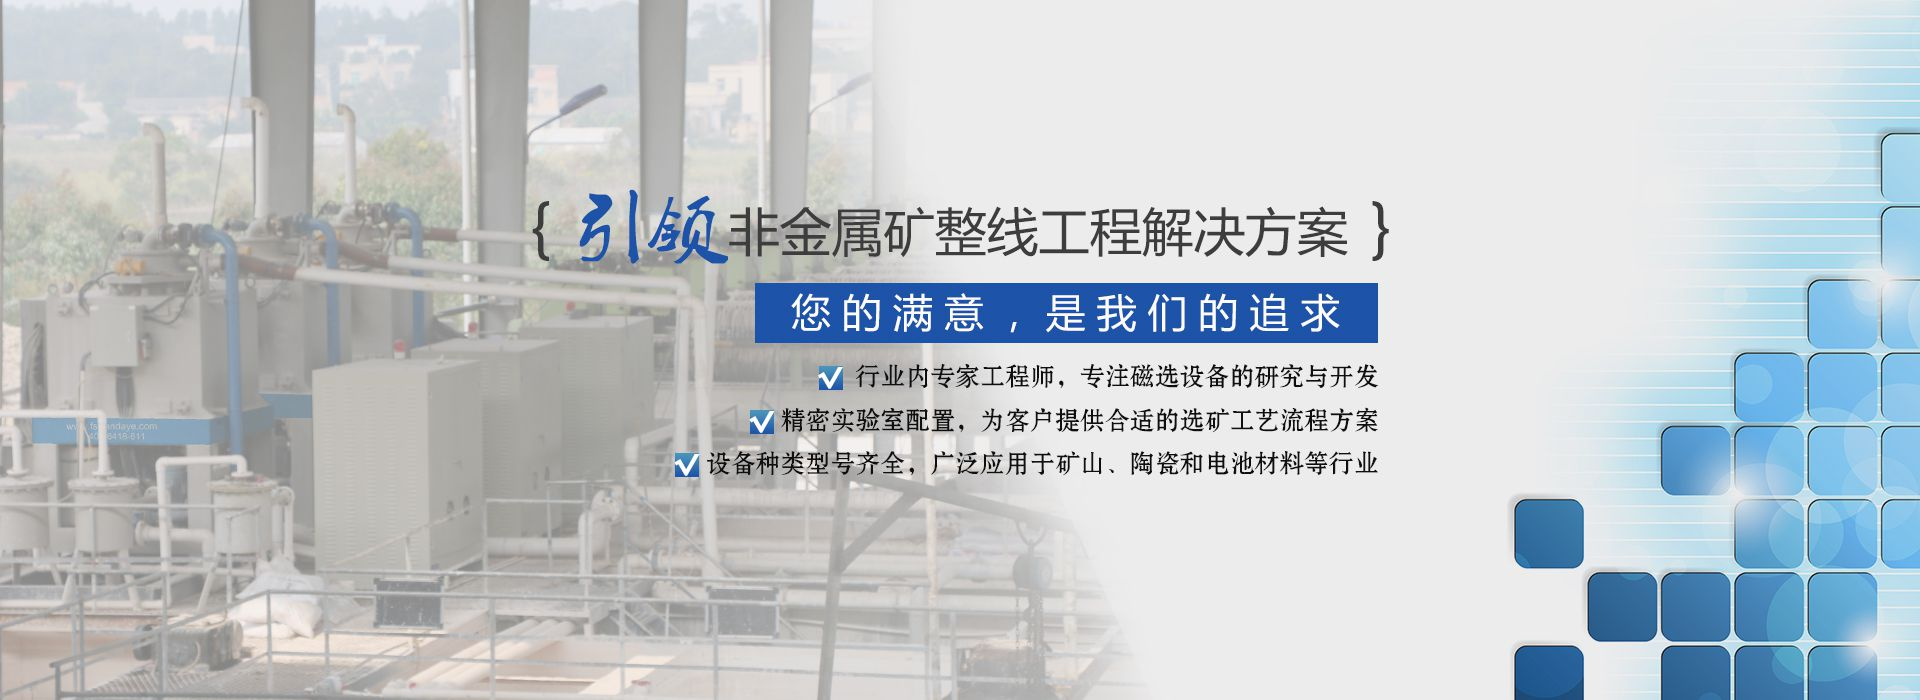 s10英雄联meng下zhu平台:引领非金属矿整线工程解决fang案